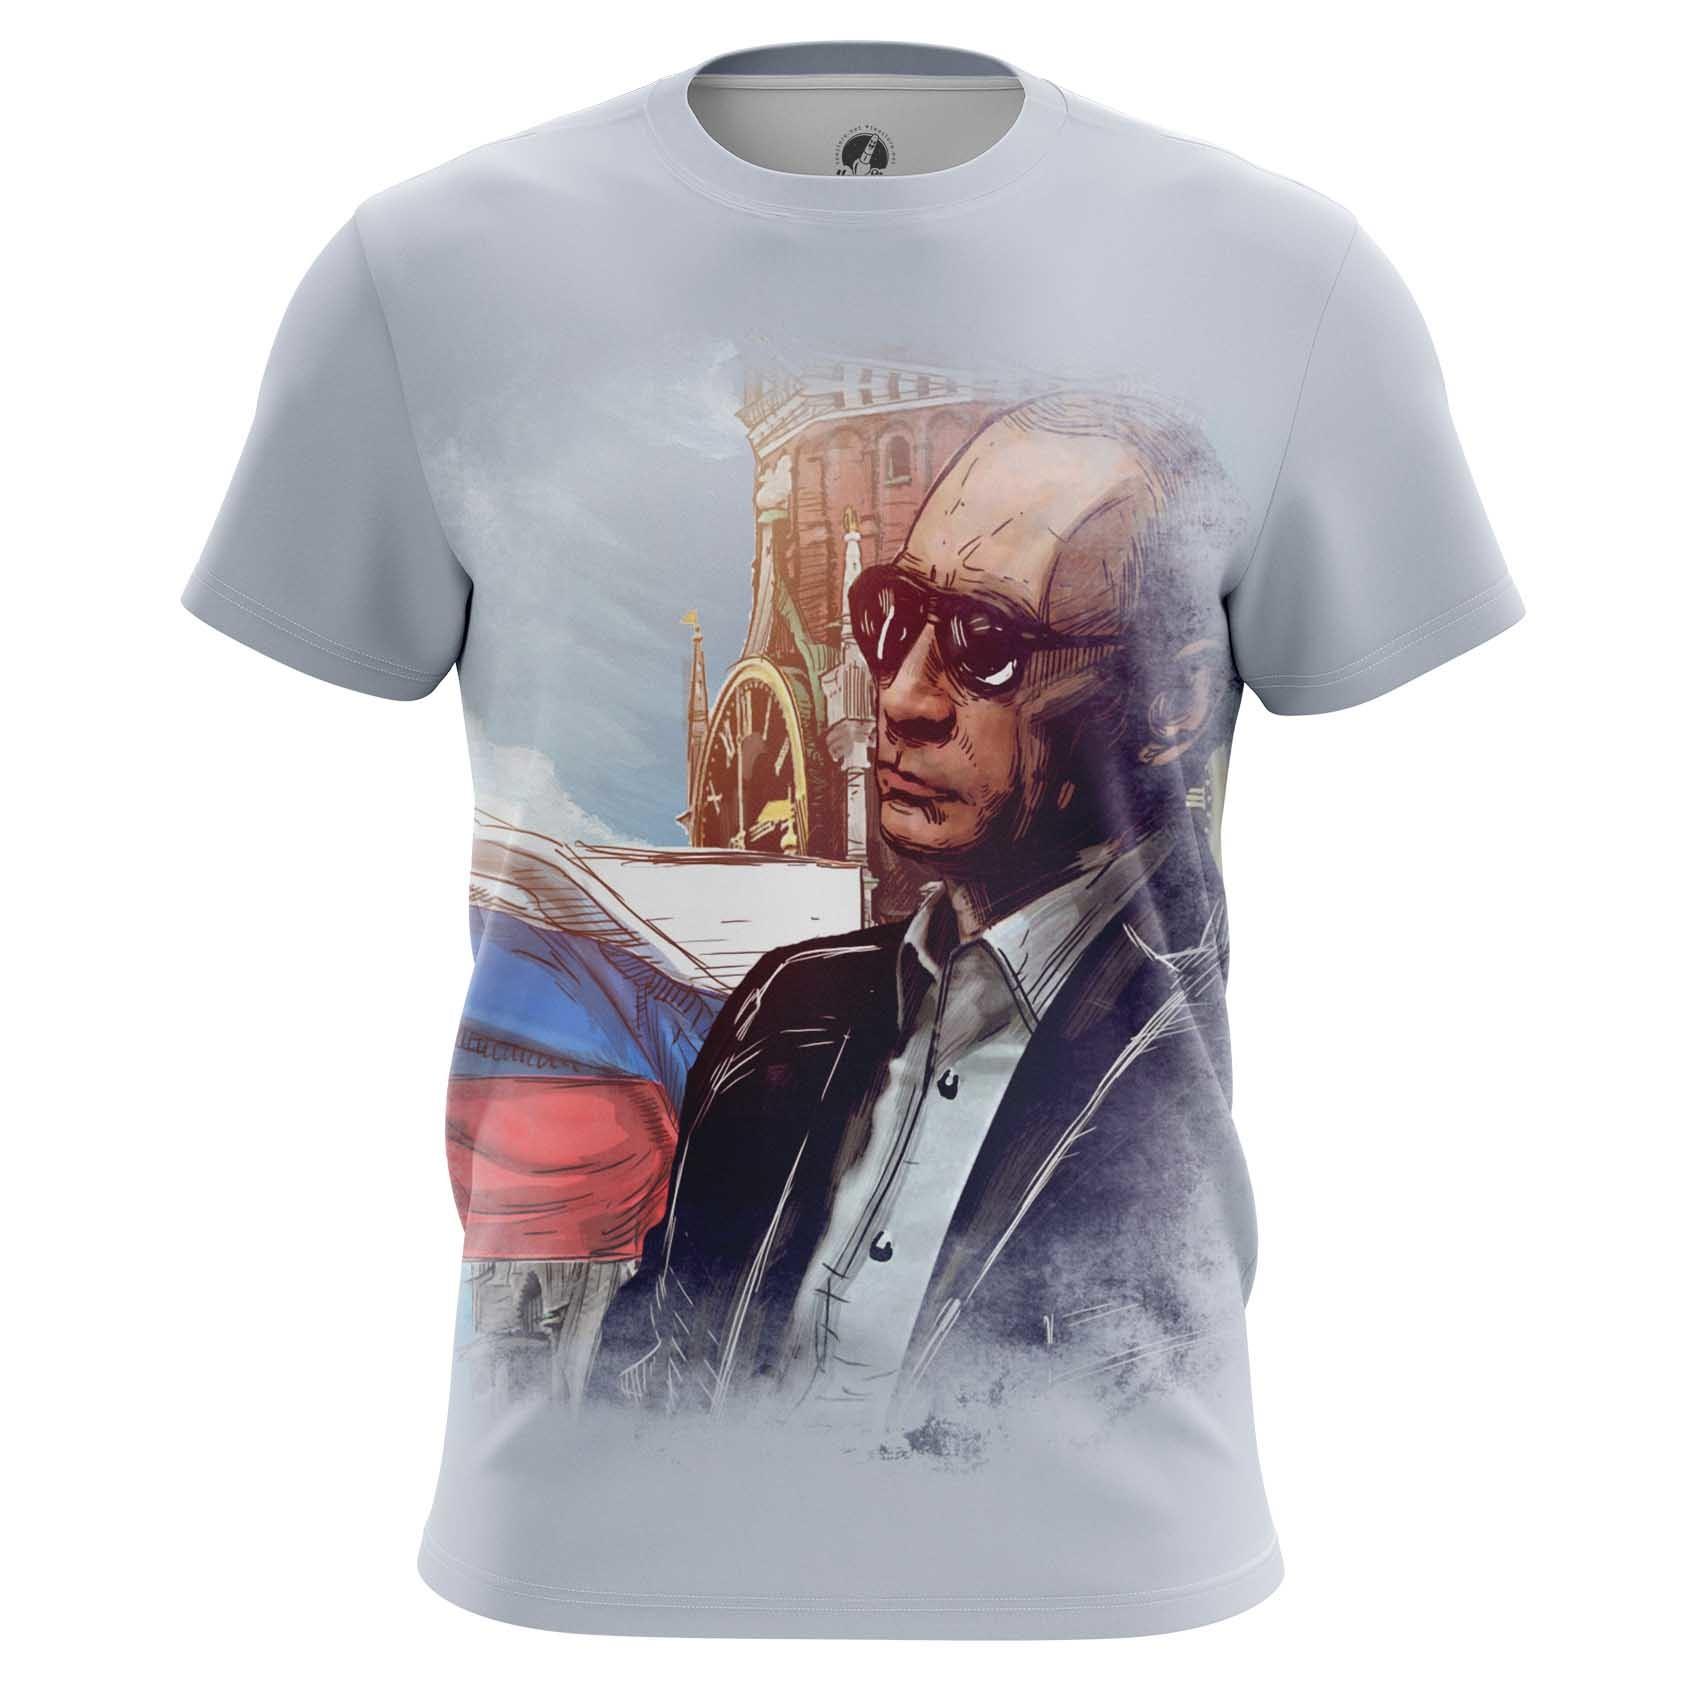 Merchandise Men'S T-Shirt Vladimir Putin President Russia Russian President